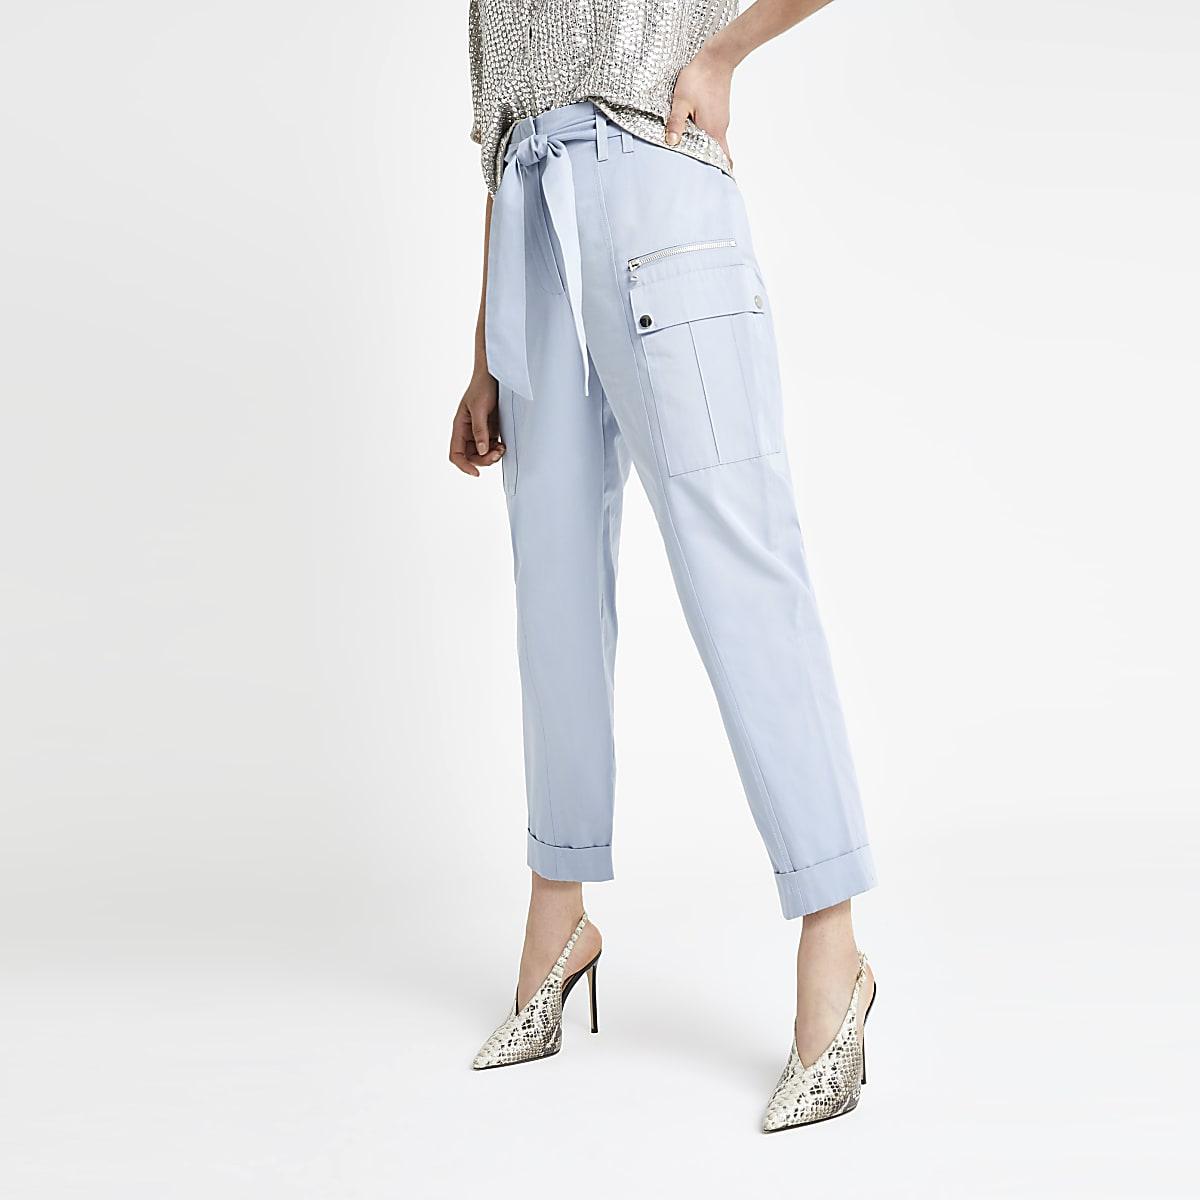 Blue utility peg pants